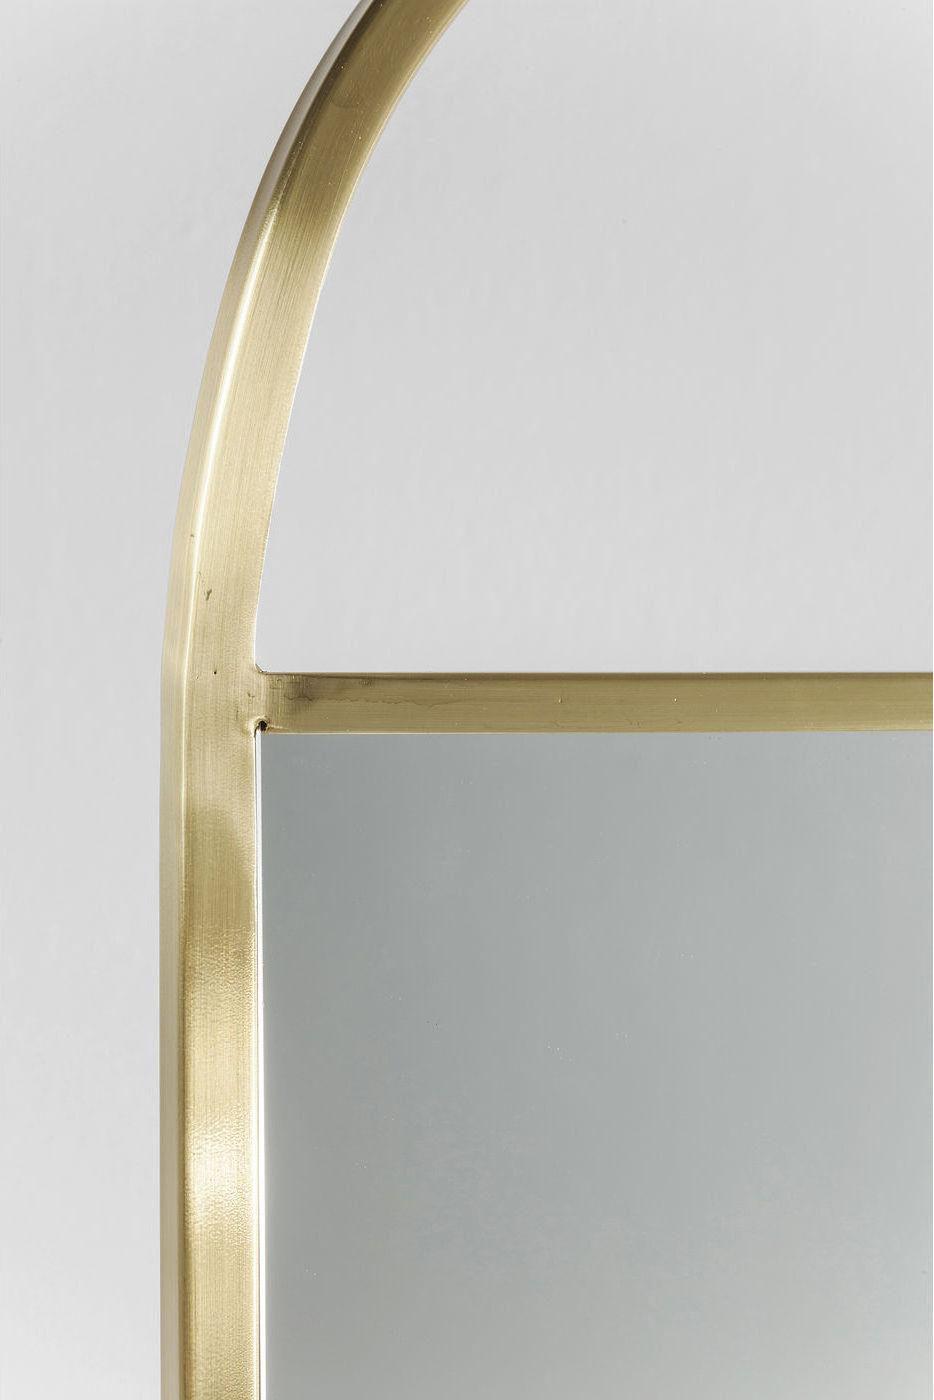 kare design staande spiegel casino goud meubelen verlichting. Black Bedroom Furniture Sets. Home Design Ideas